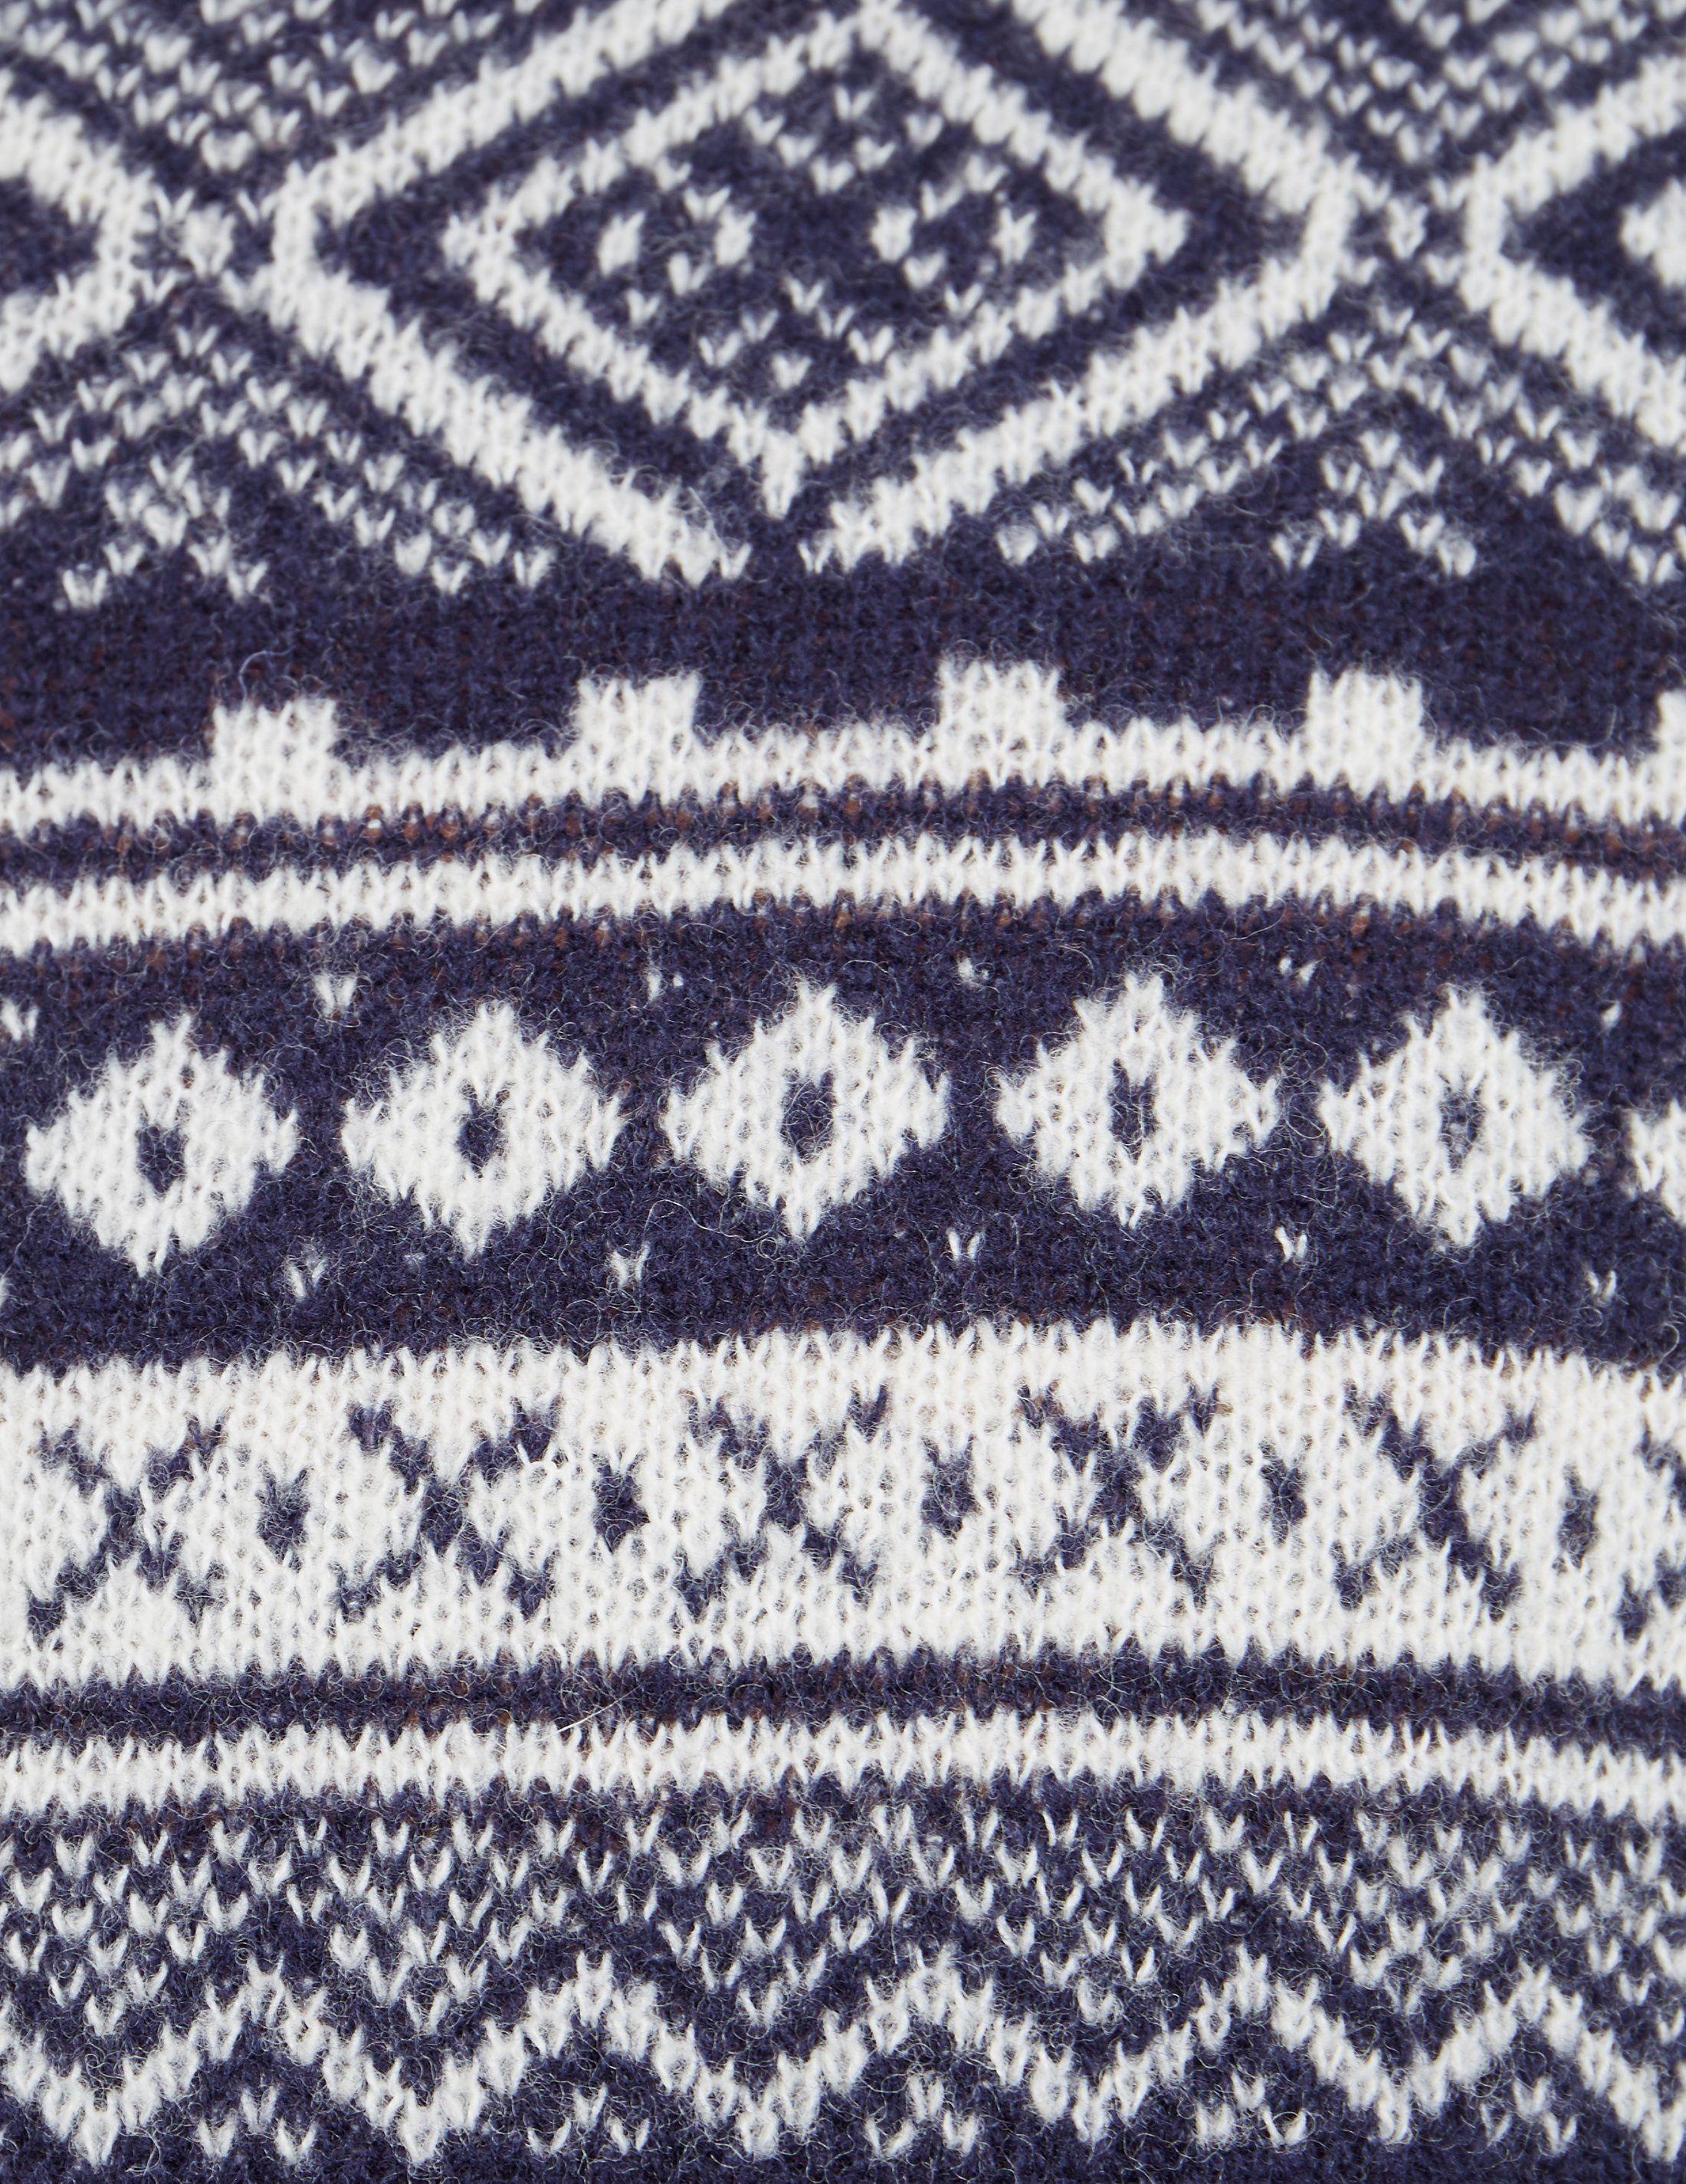 Barbour Cove Fairisle Knitted Jumper | Tessuti